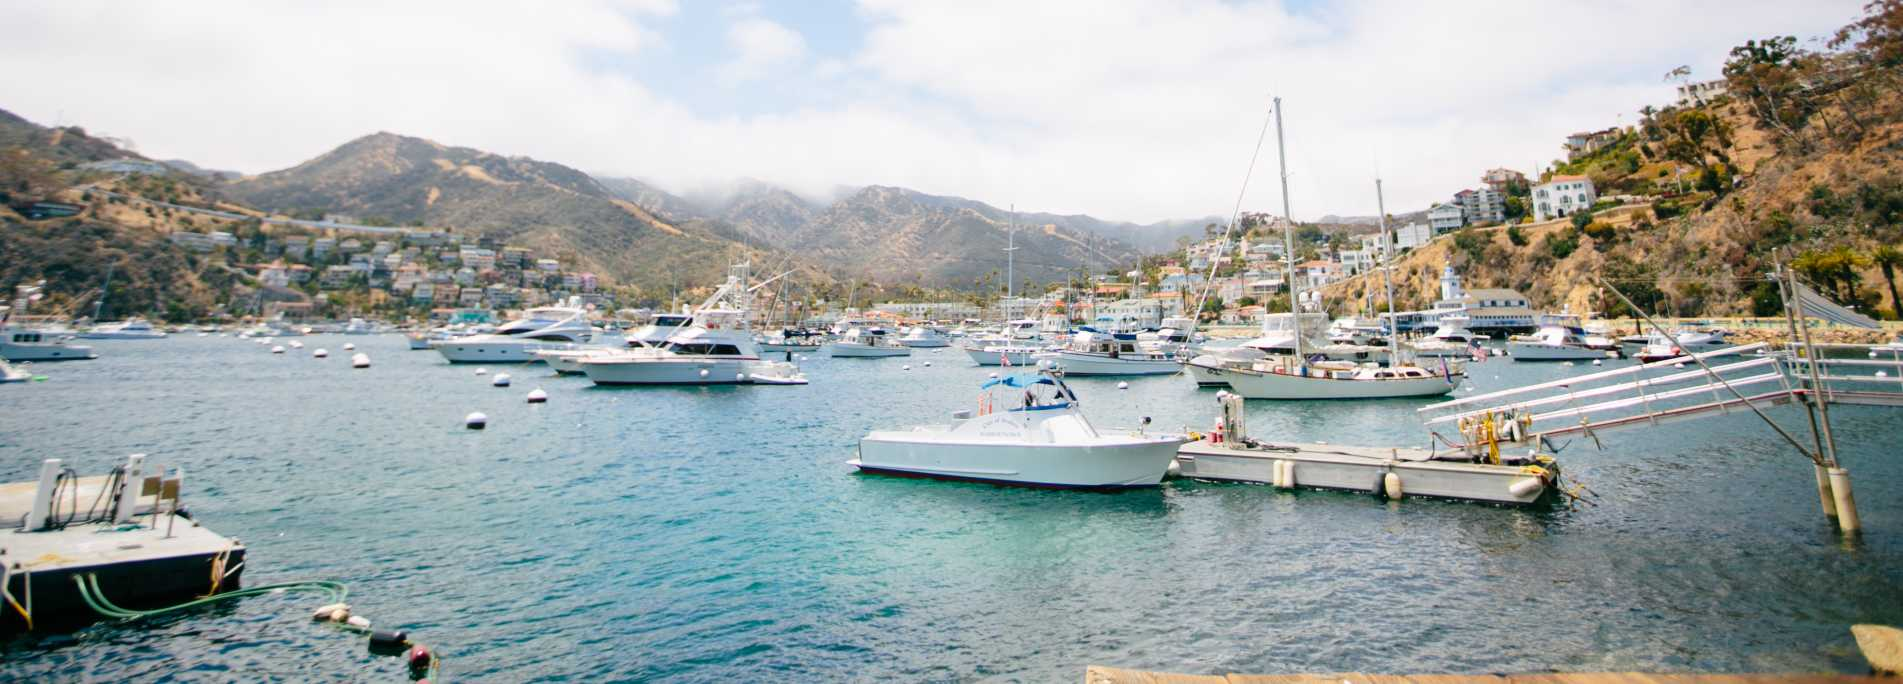 Weather for Avalon (Santa Catalina Island), California, USA